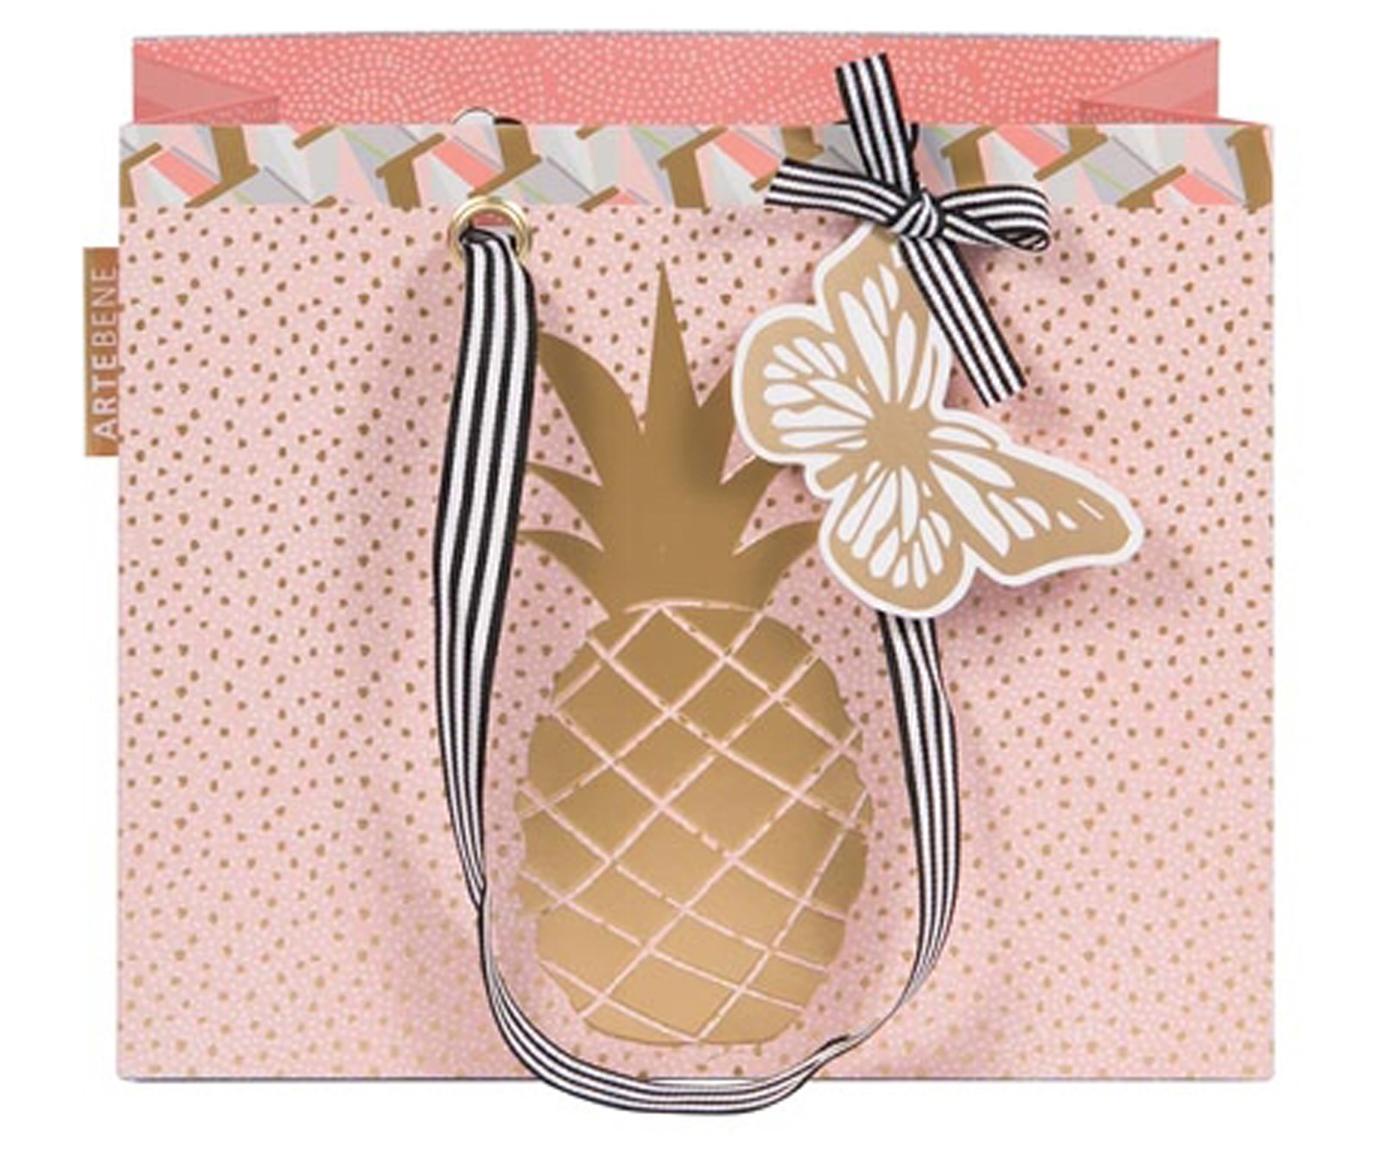 Bolsa regalo Pineapple, Bolsa: papel, Asas: tela, Rosa, dorado, An 22 x Al 18 cm